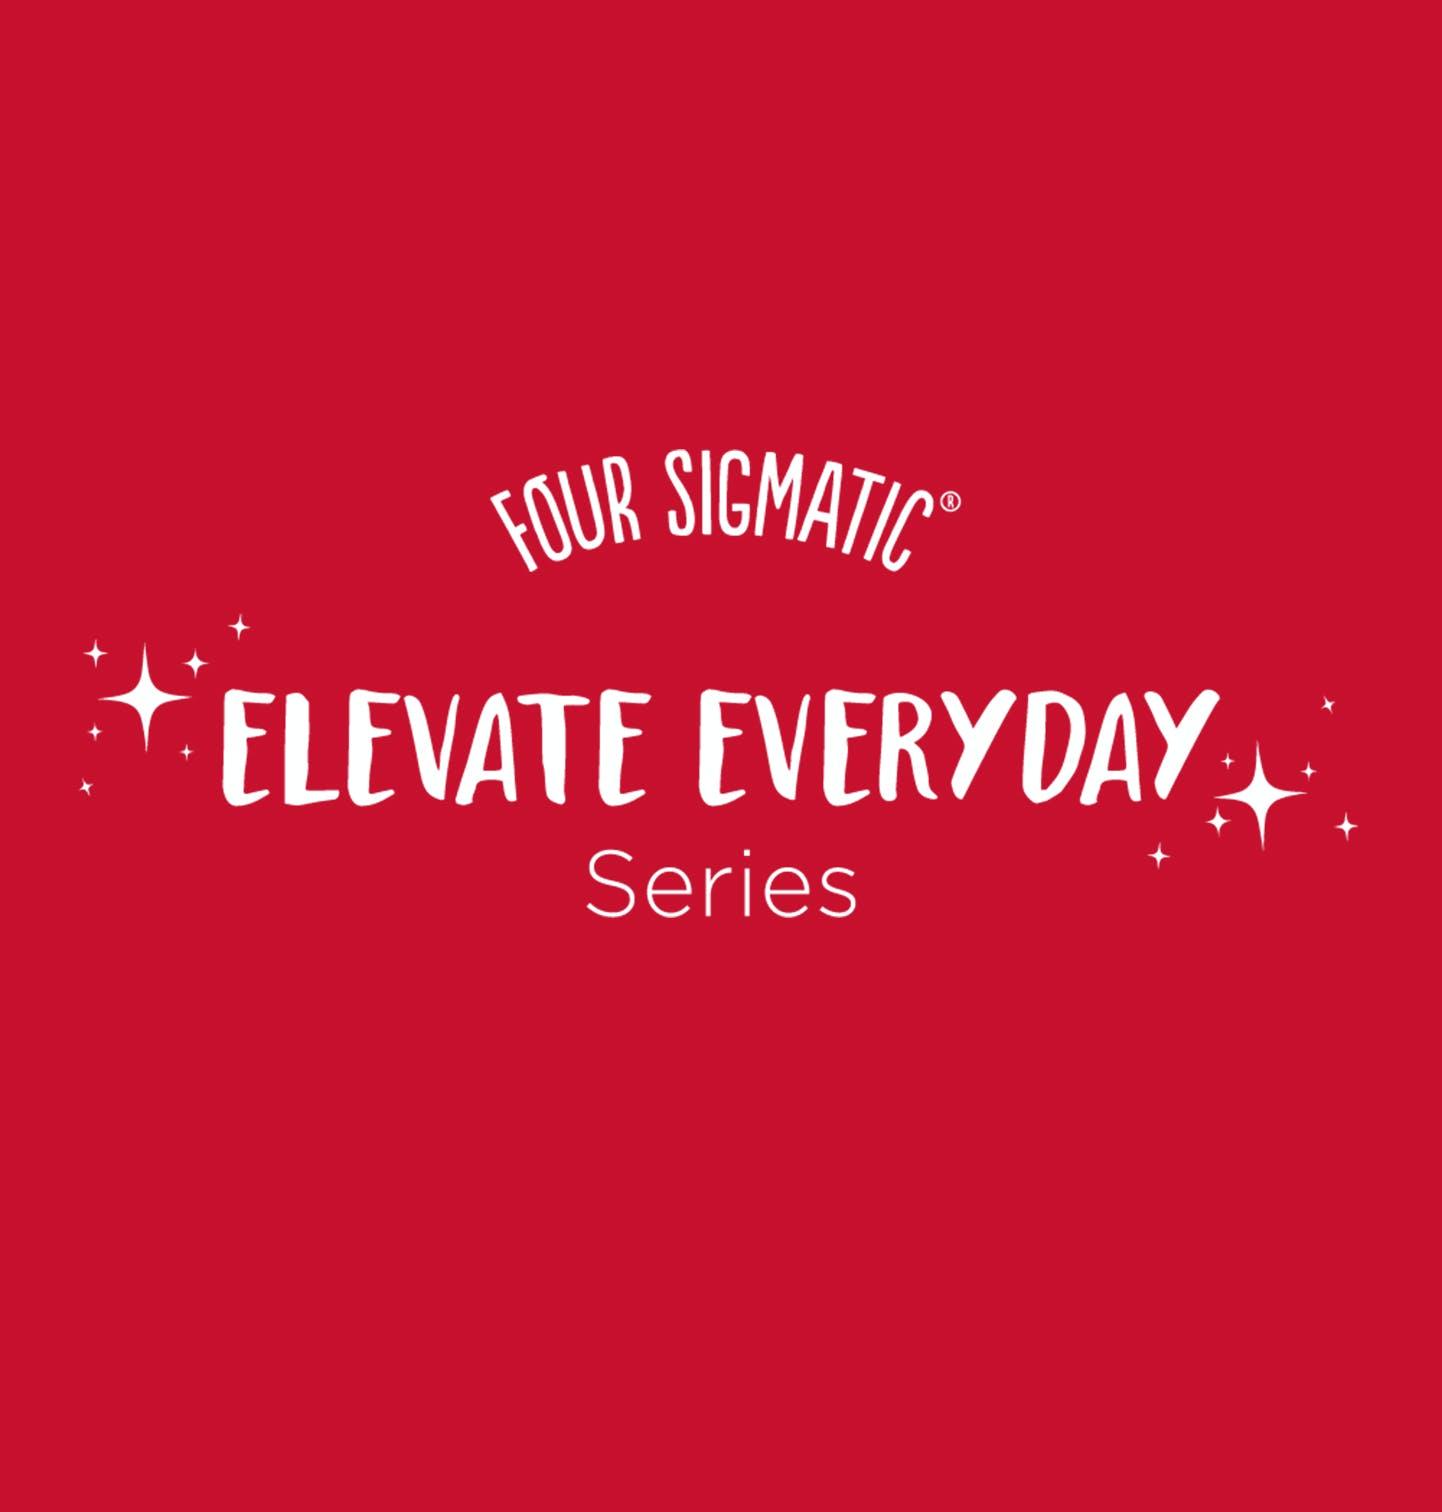 Elevate Everyday Series